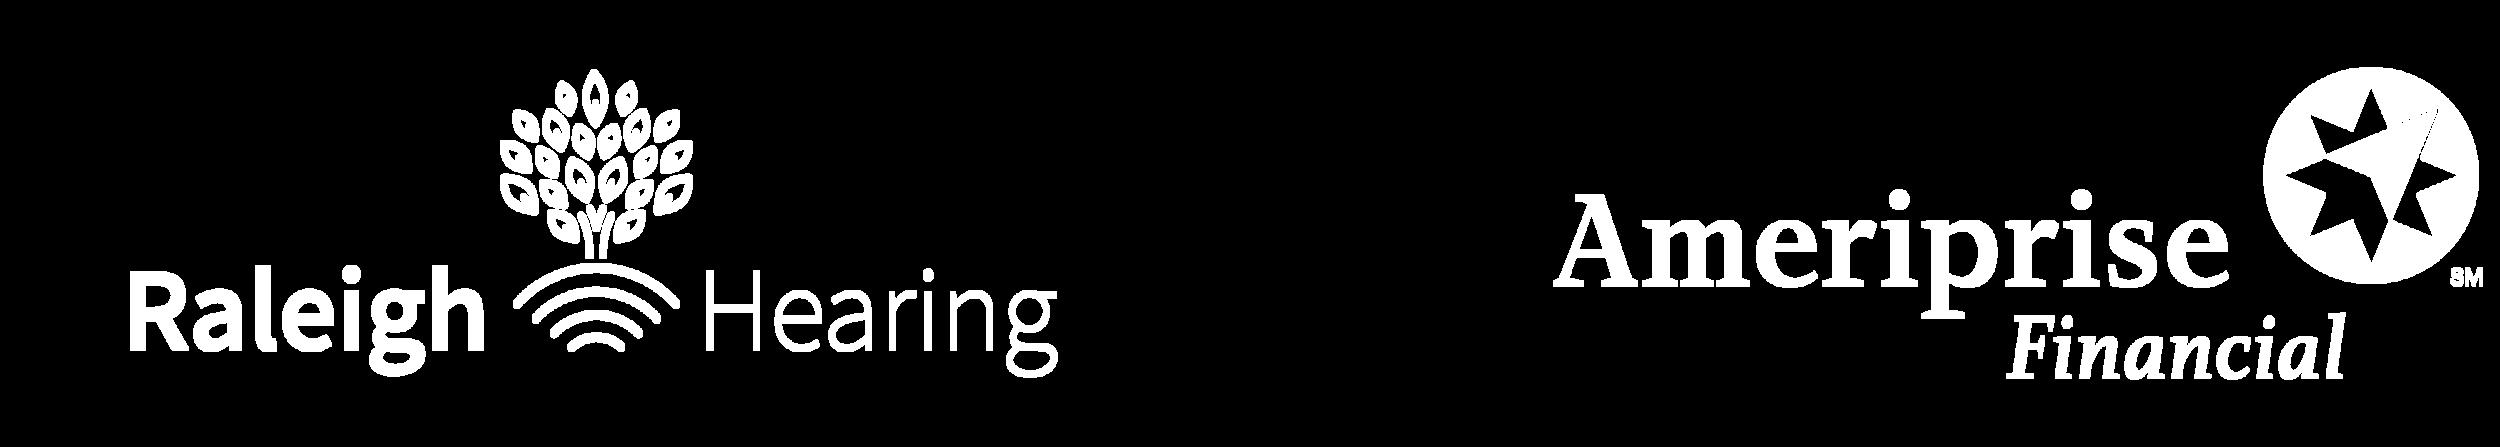 Client logos4-02.png